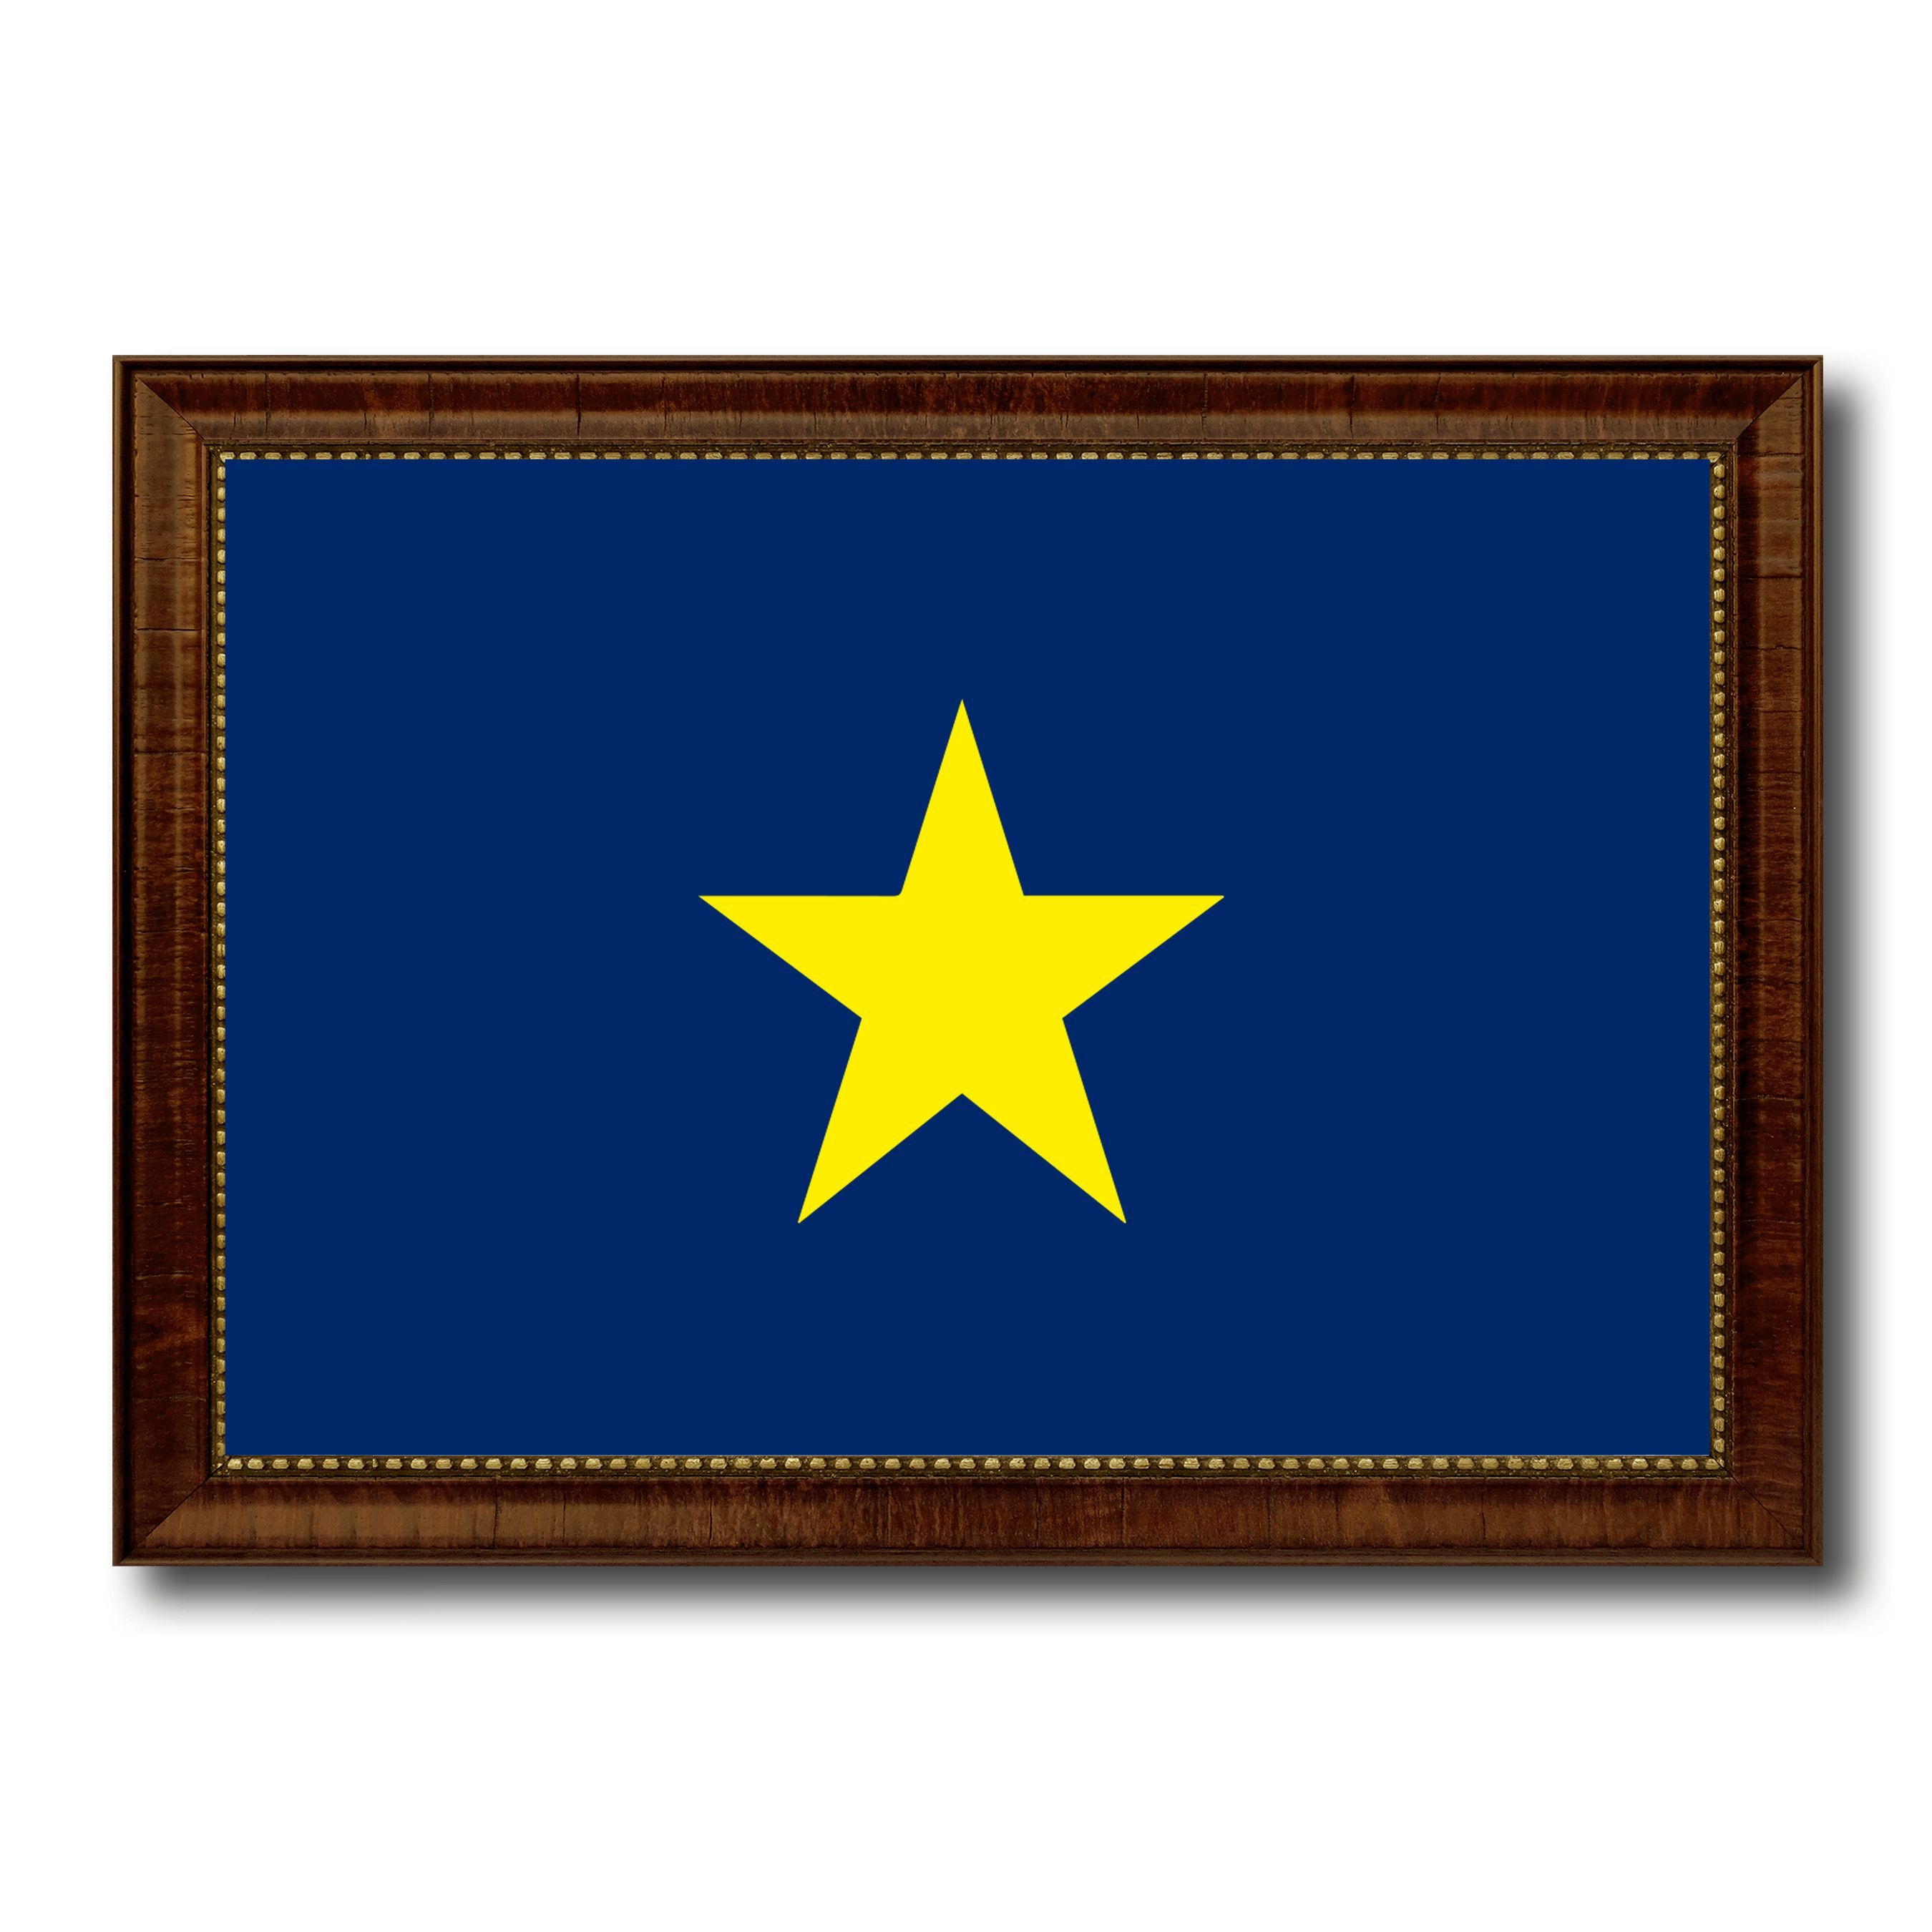 Burnet\'s 1st Texas Republic 1836-1839 Military Flag Canvas Print ...